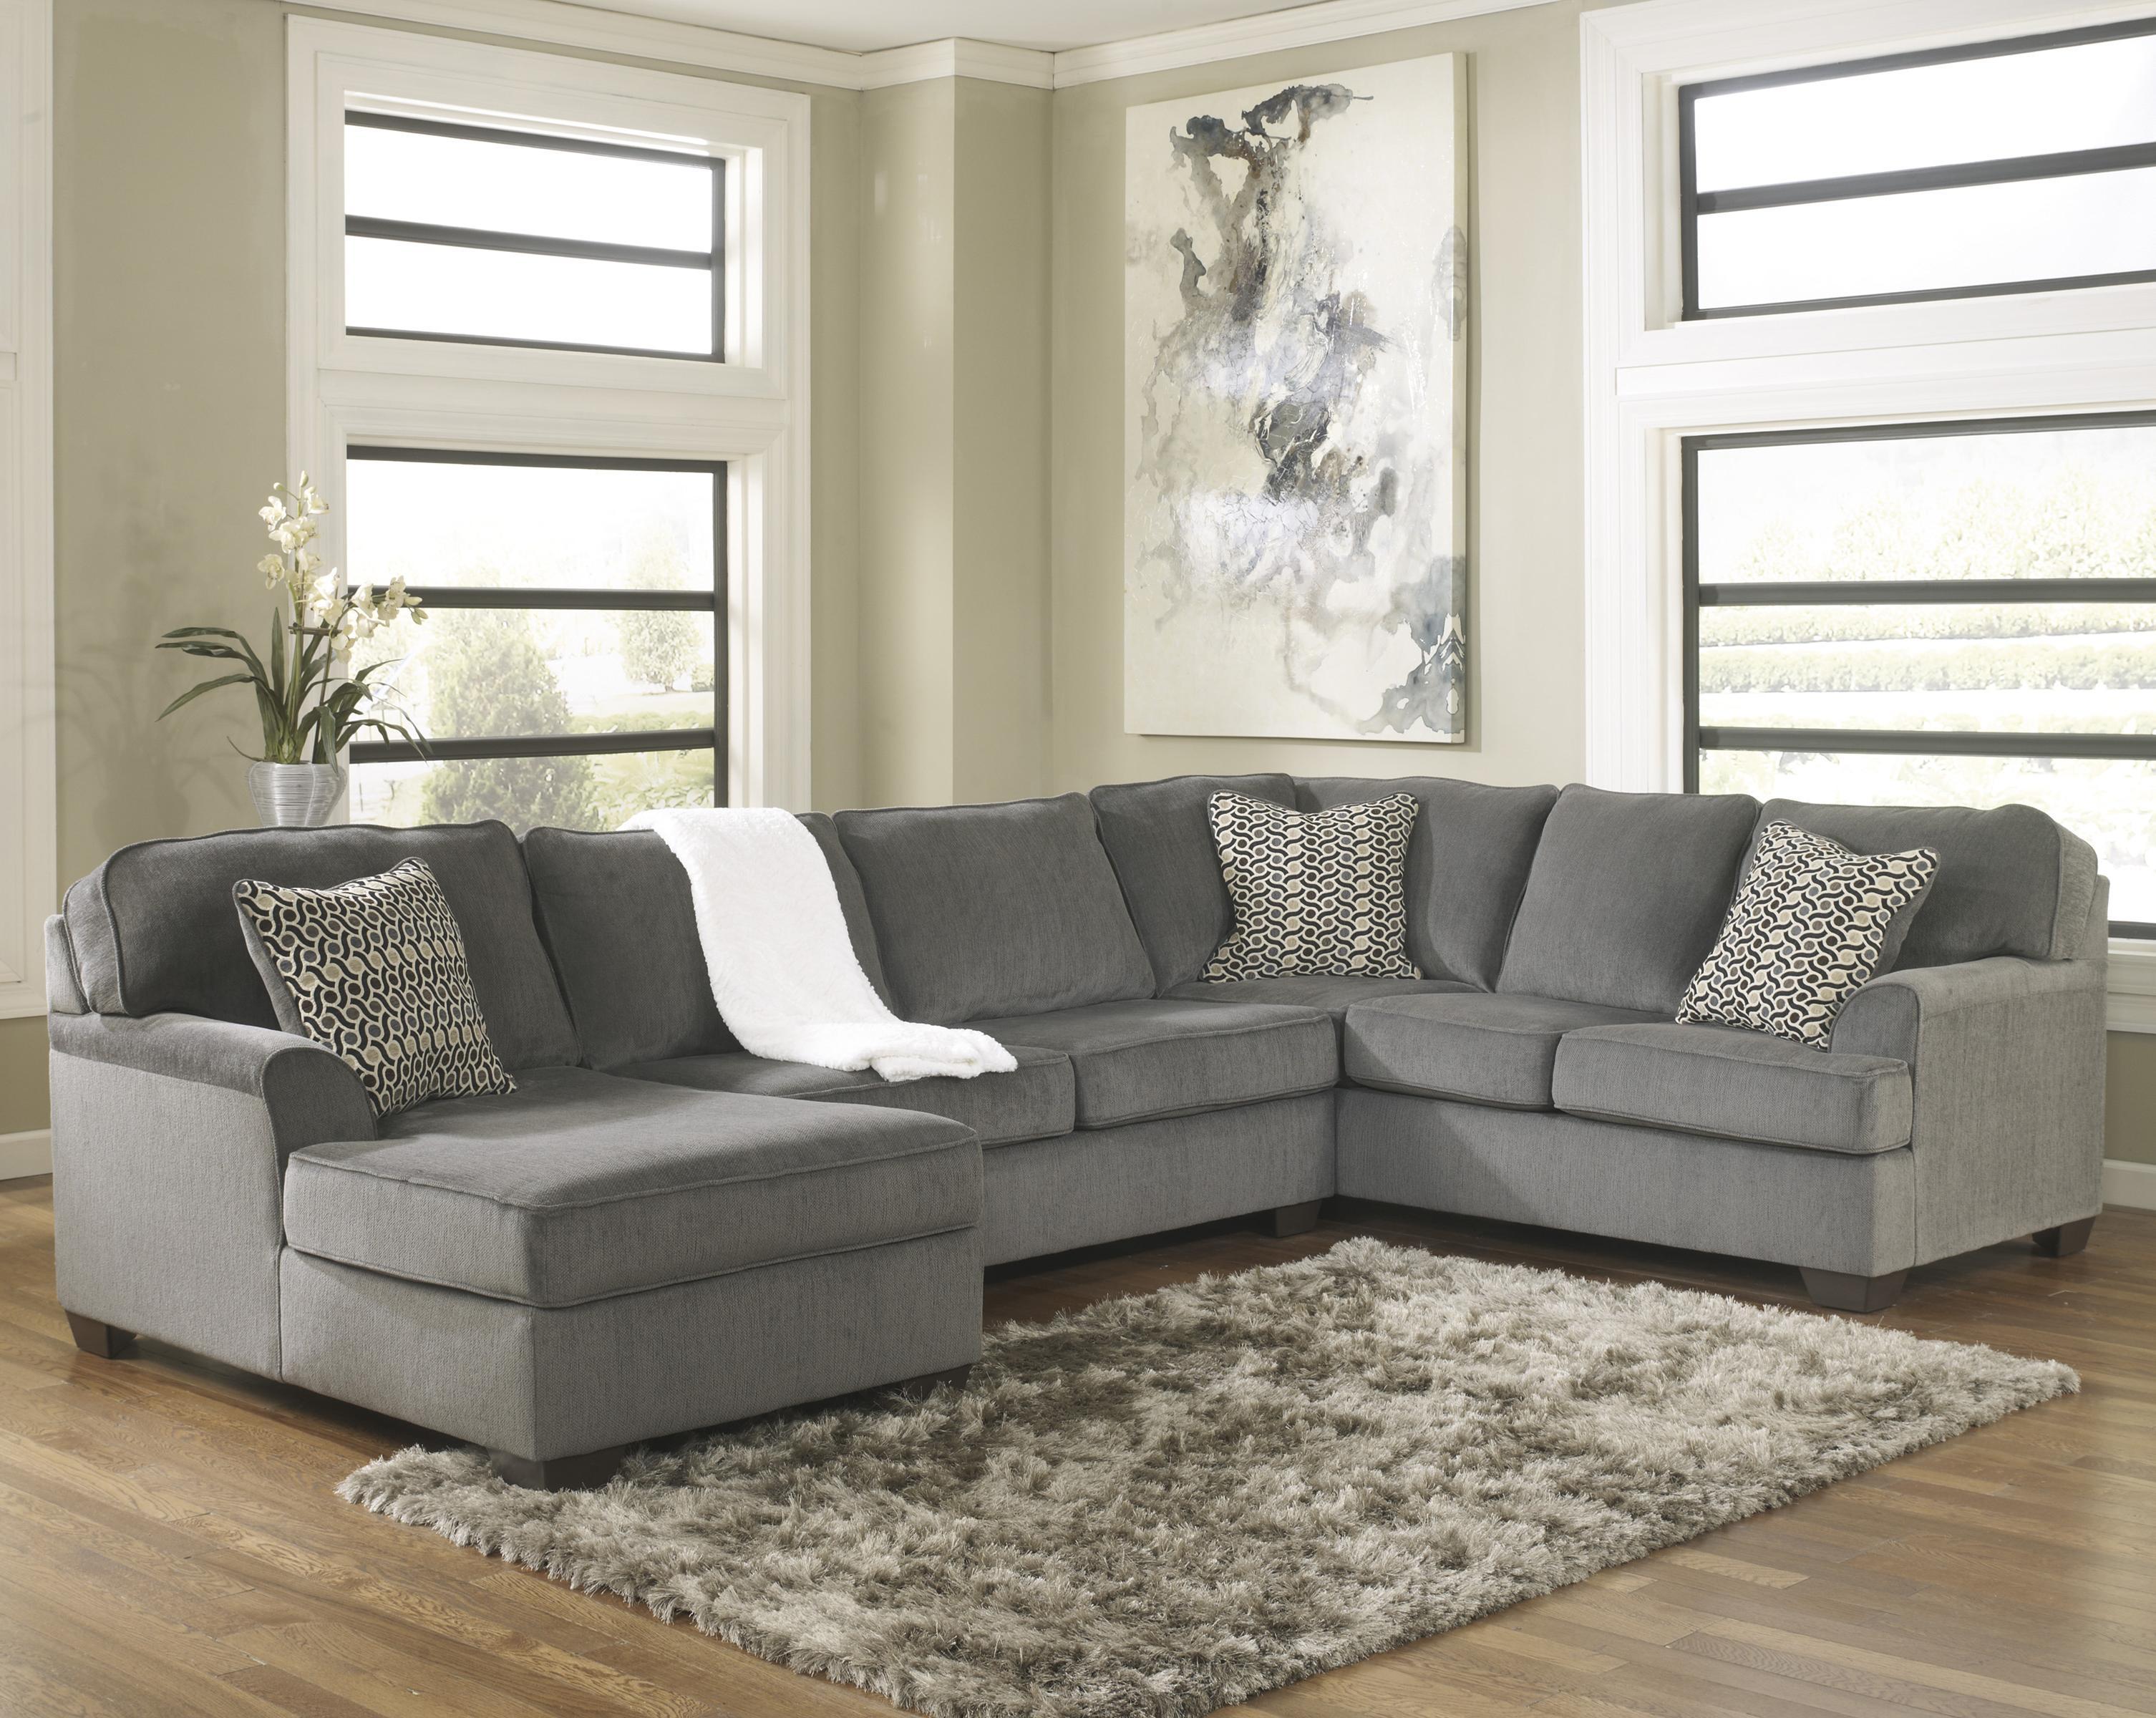 Ashley Furniture Loric  Smoke Contemporary 3Piece